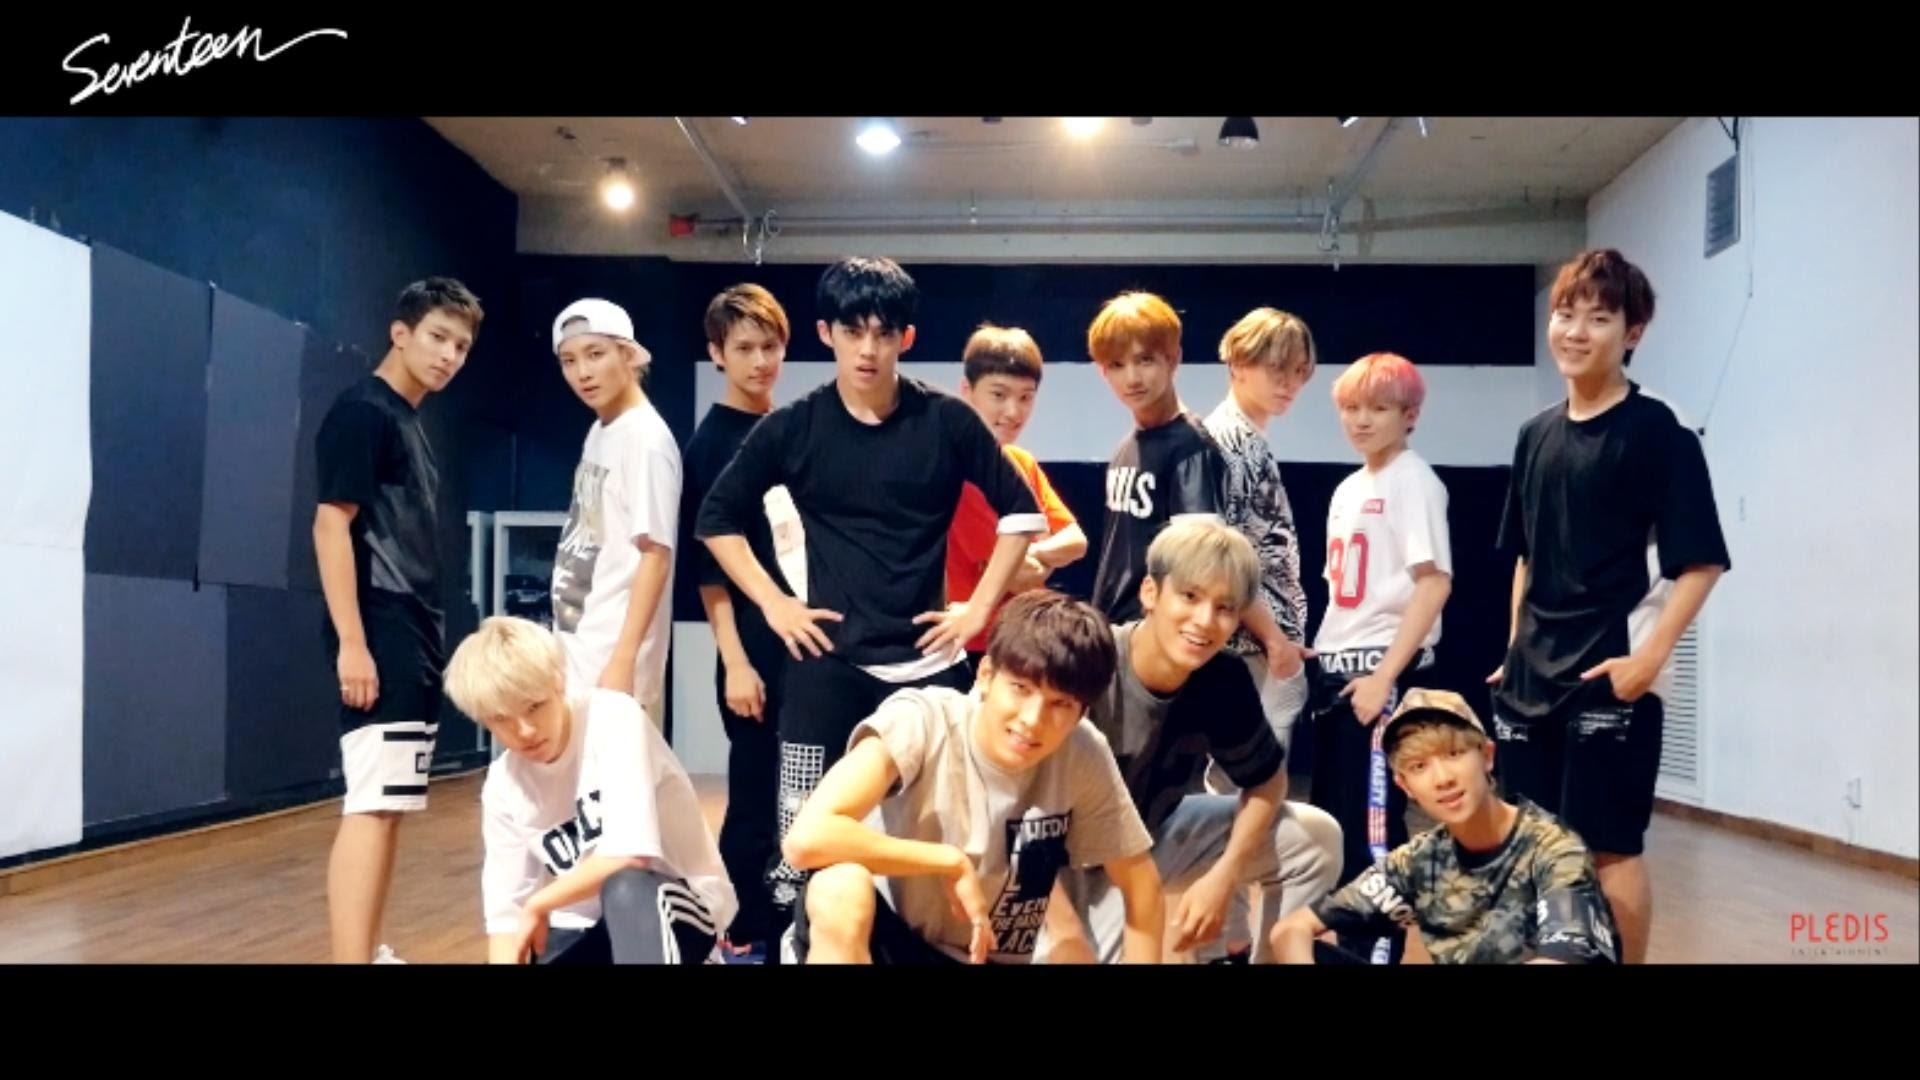 [Dance Practice] SEVENTEEN(세븐틴) – 만세(MANSAE) – FOLLOW ME Ver. – YouTube